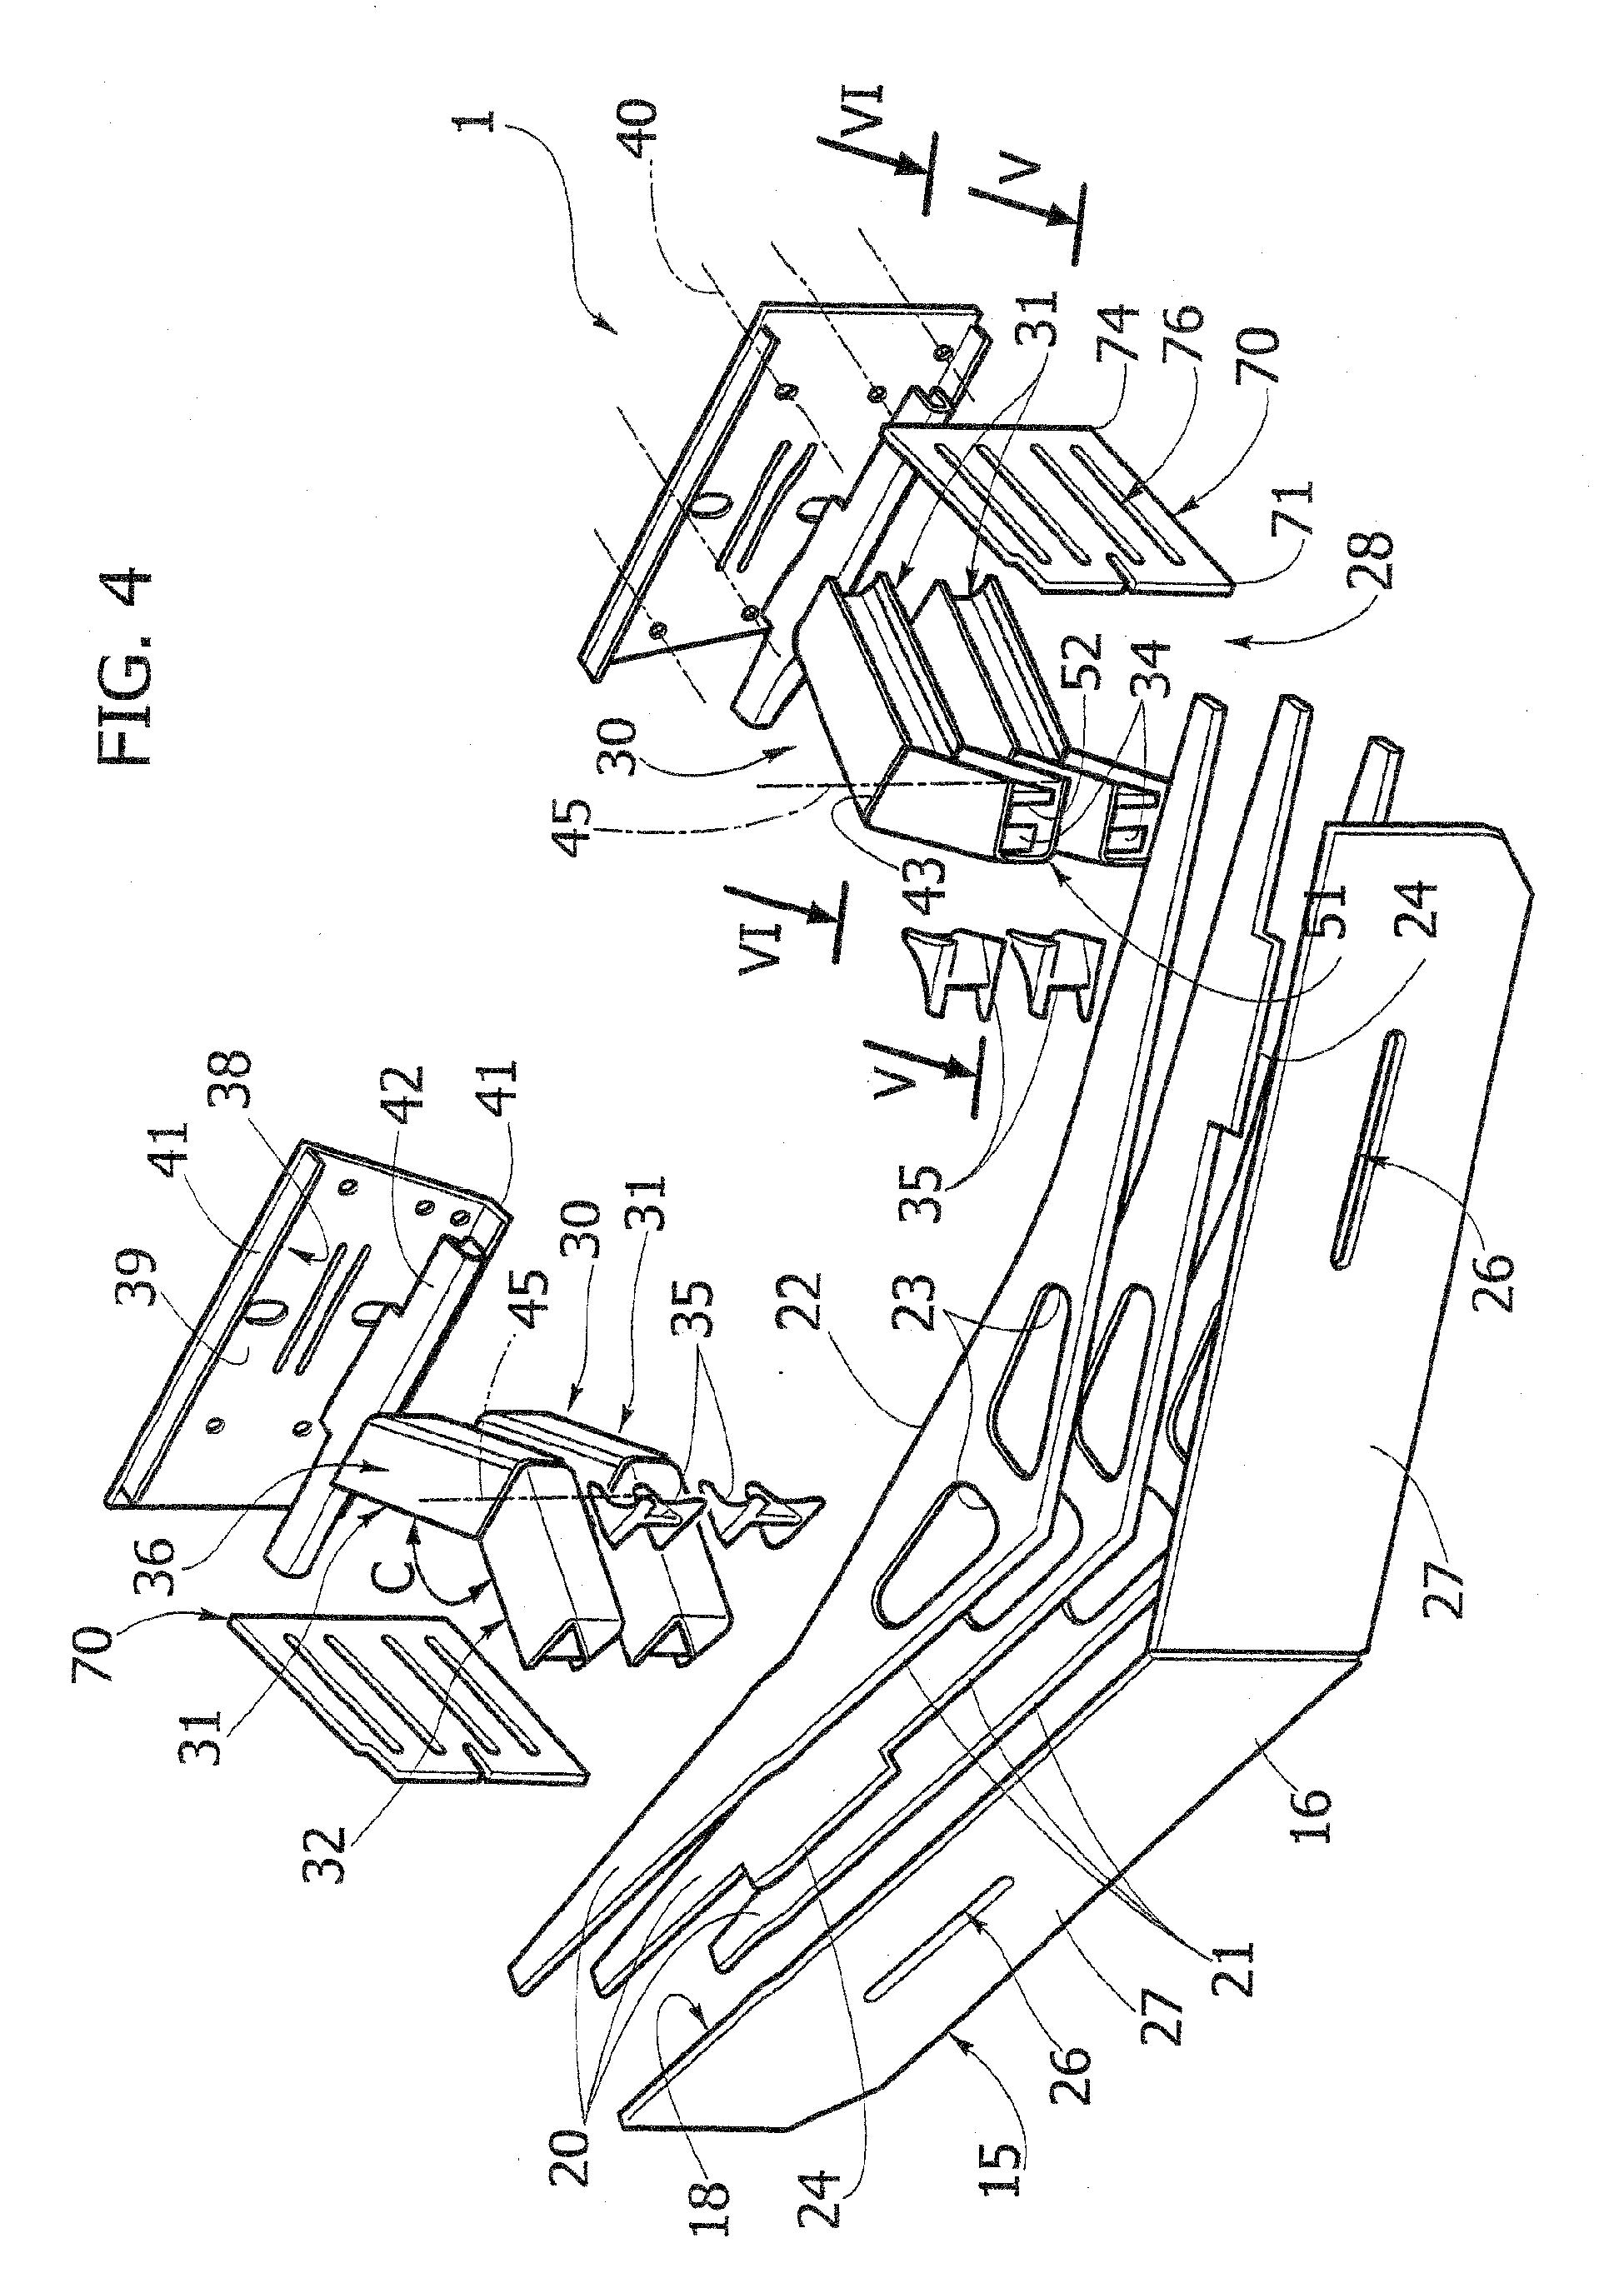 Chevy 350 Engine Diagram Chevy 350 Engine Parts Diagram